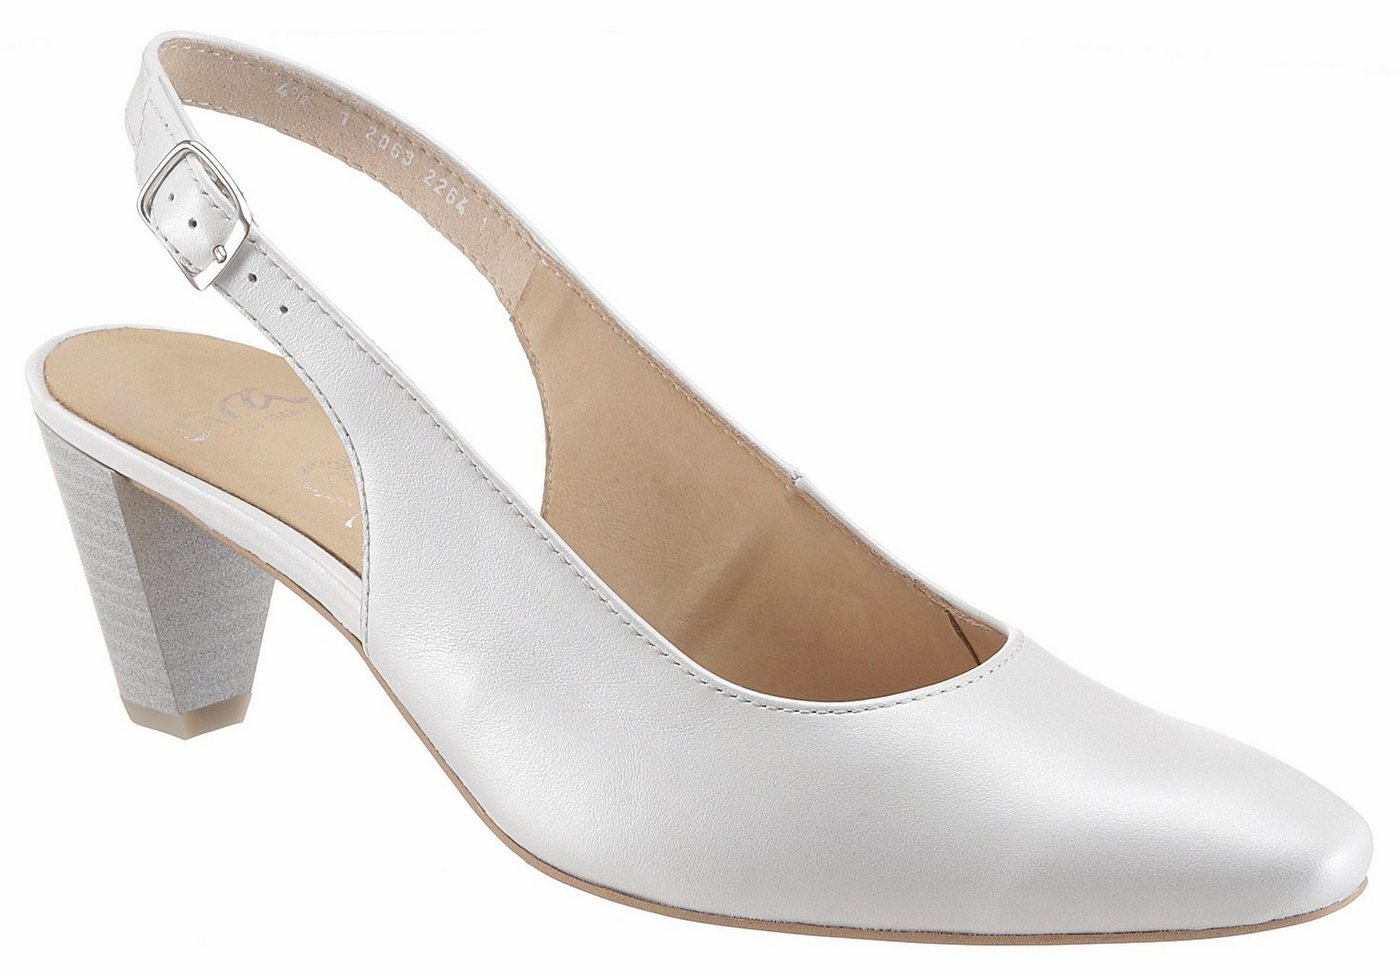 Damen Ara Slingpumps perfekt als Brautschuh weiß   04054928125648